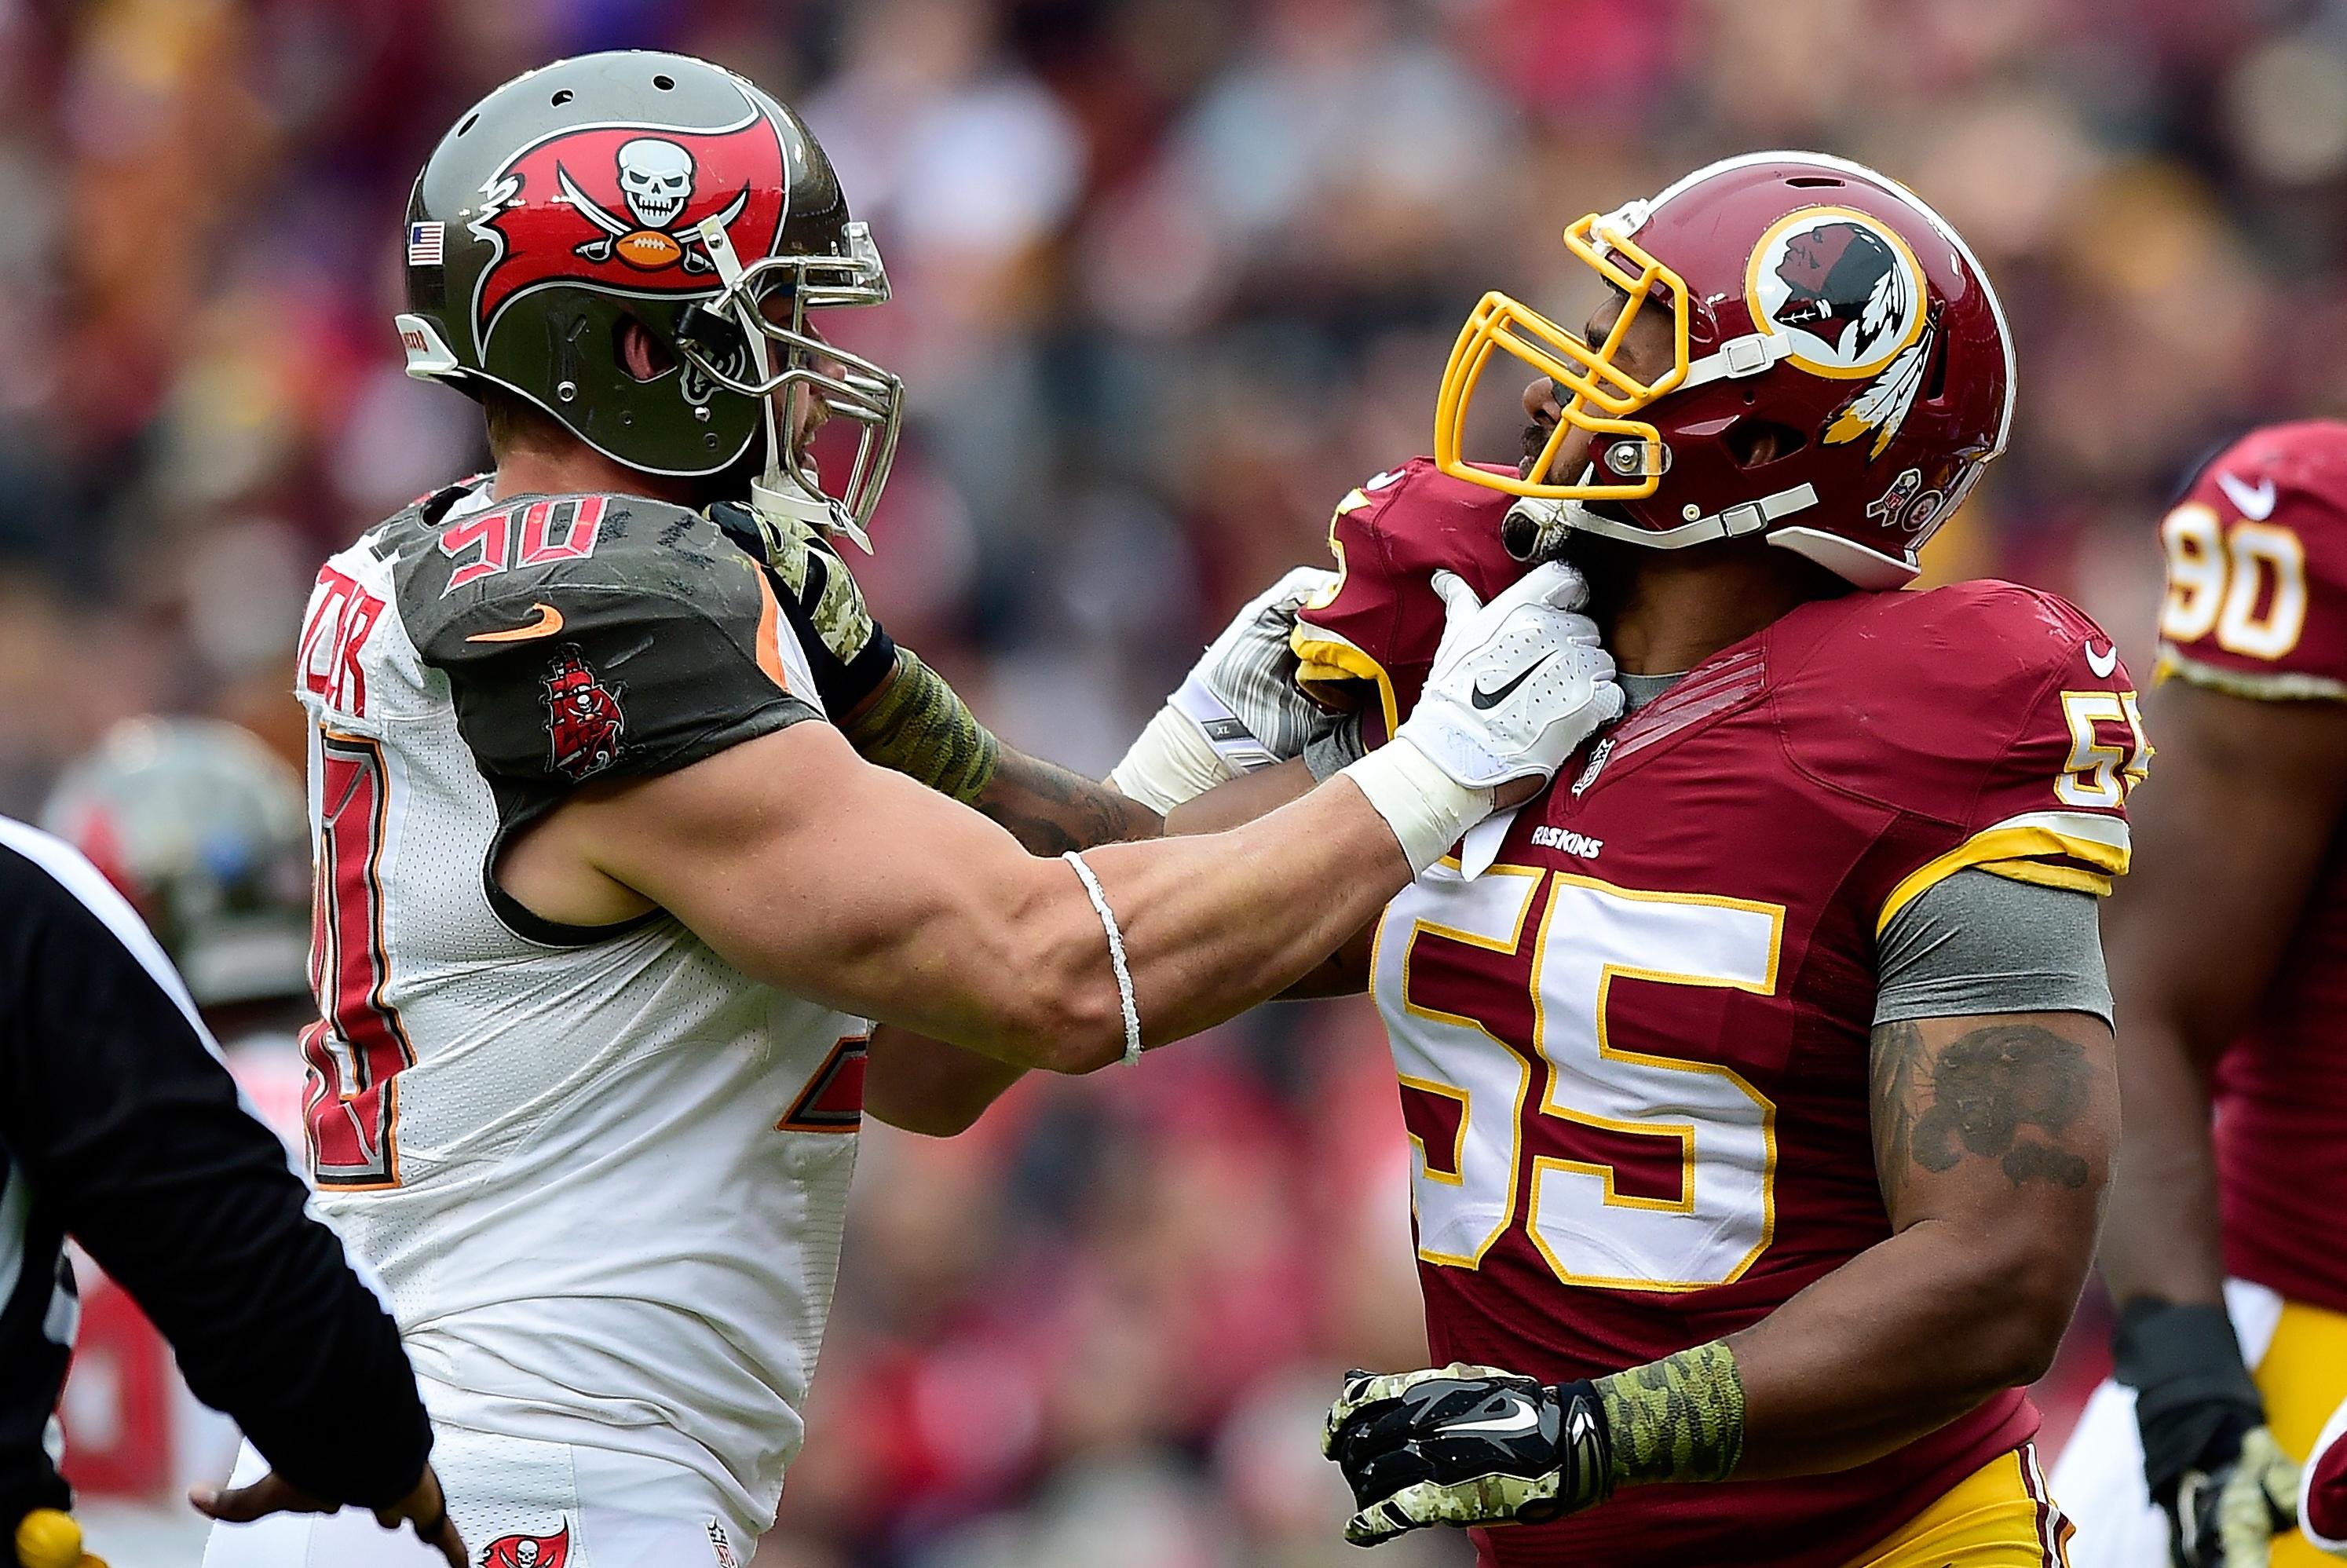 Wholesale NFL Jerseys - Tampa Bay Buccaneers vs. Washington Redskins: Full Washington Game ...